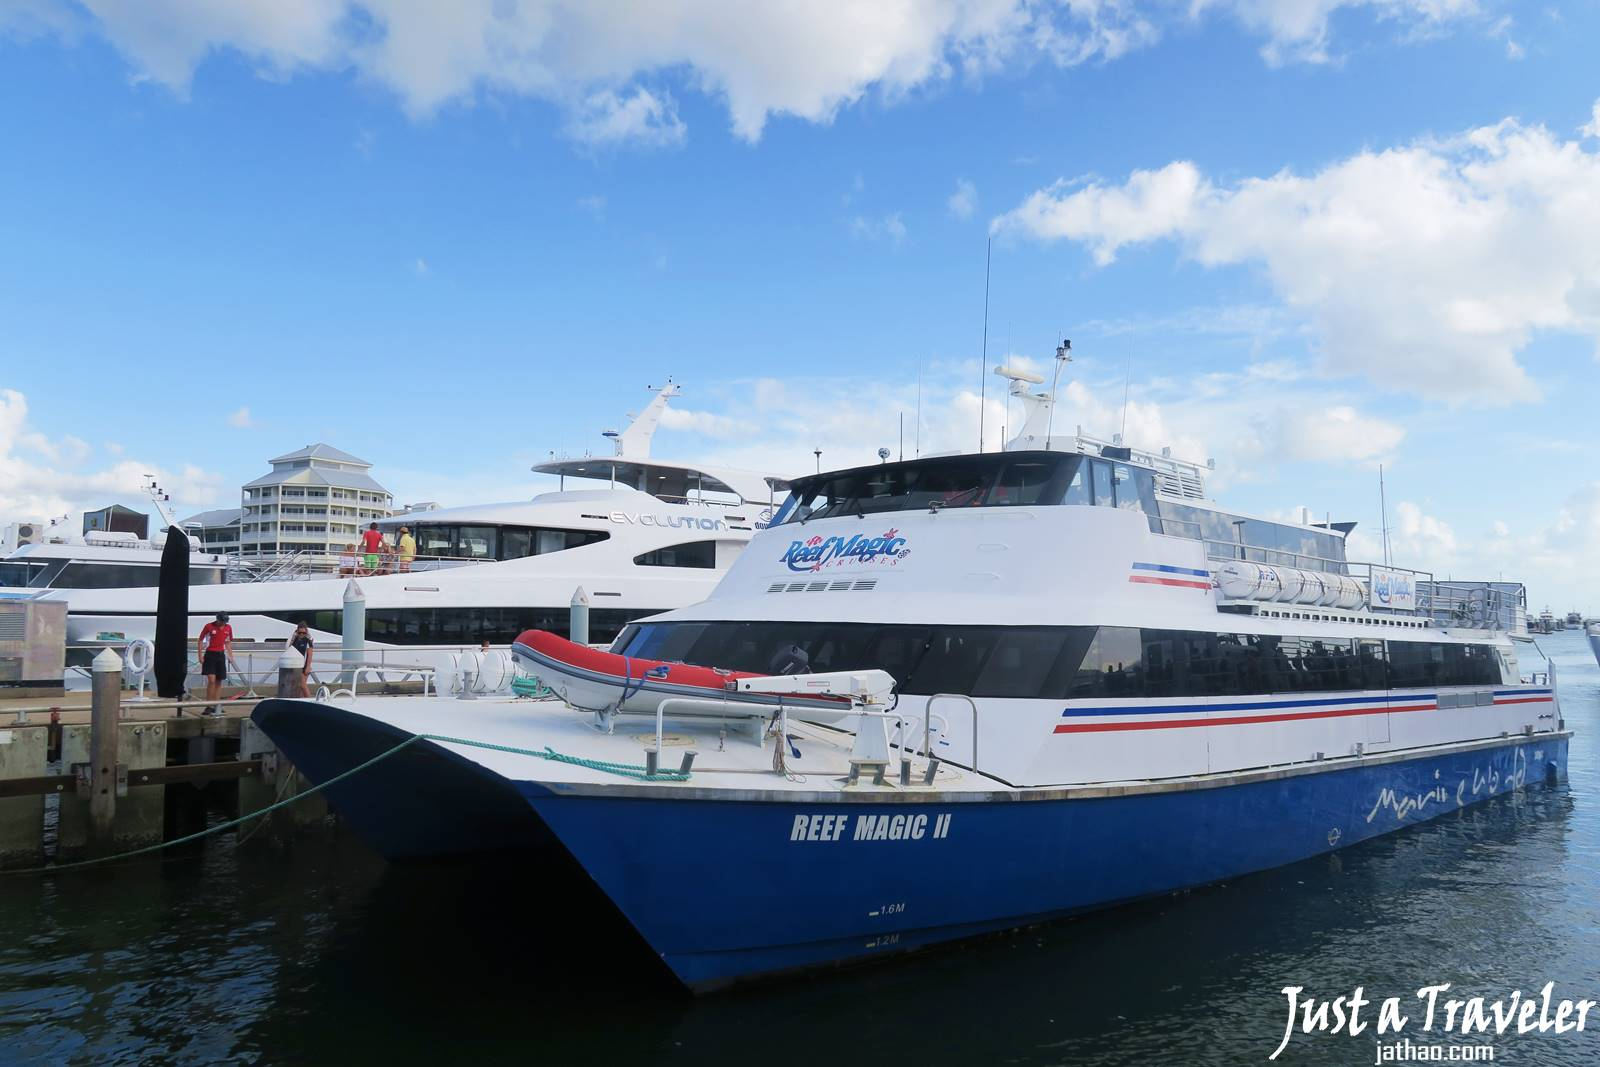 凱恩斯-港口-大堡礁-外堡礁-推薦-公司-旅遊-自由行-澳洲-Cairns-Outer-Great-Barrier-Reef-Travel-Australia